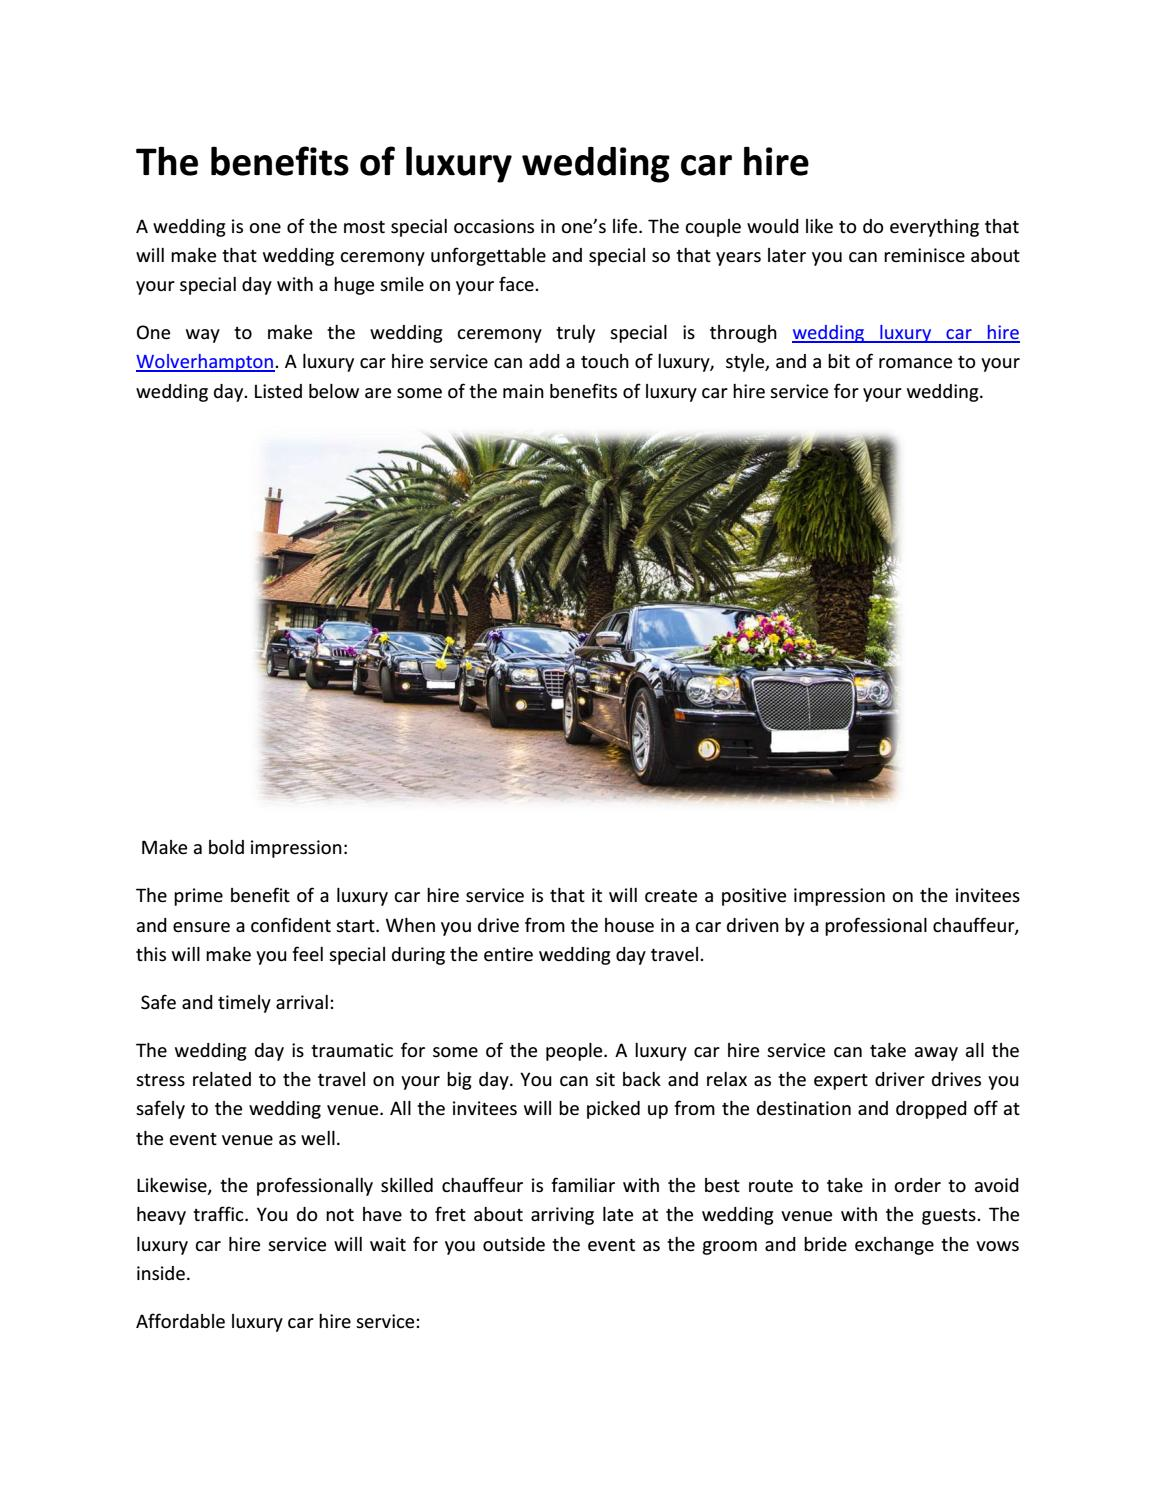 The Benefits Of Luxury Wedding Car Hire By Jamesethan Issuu